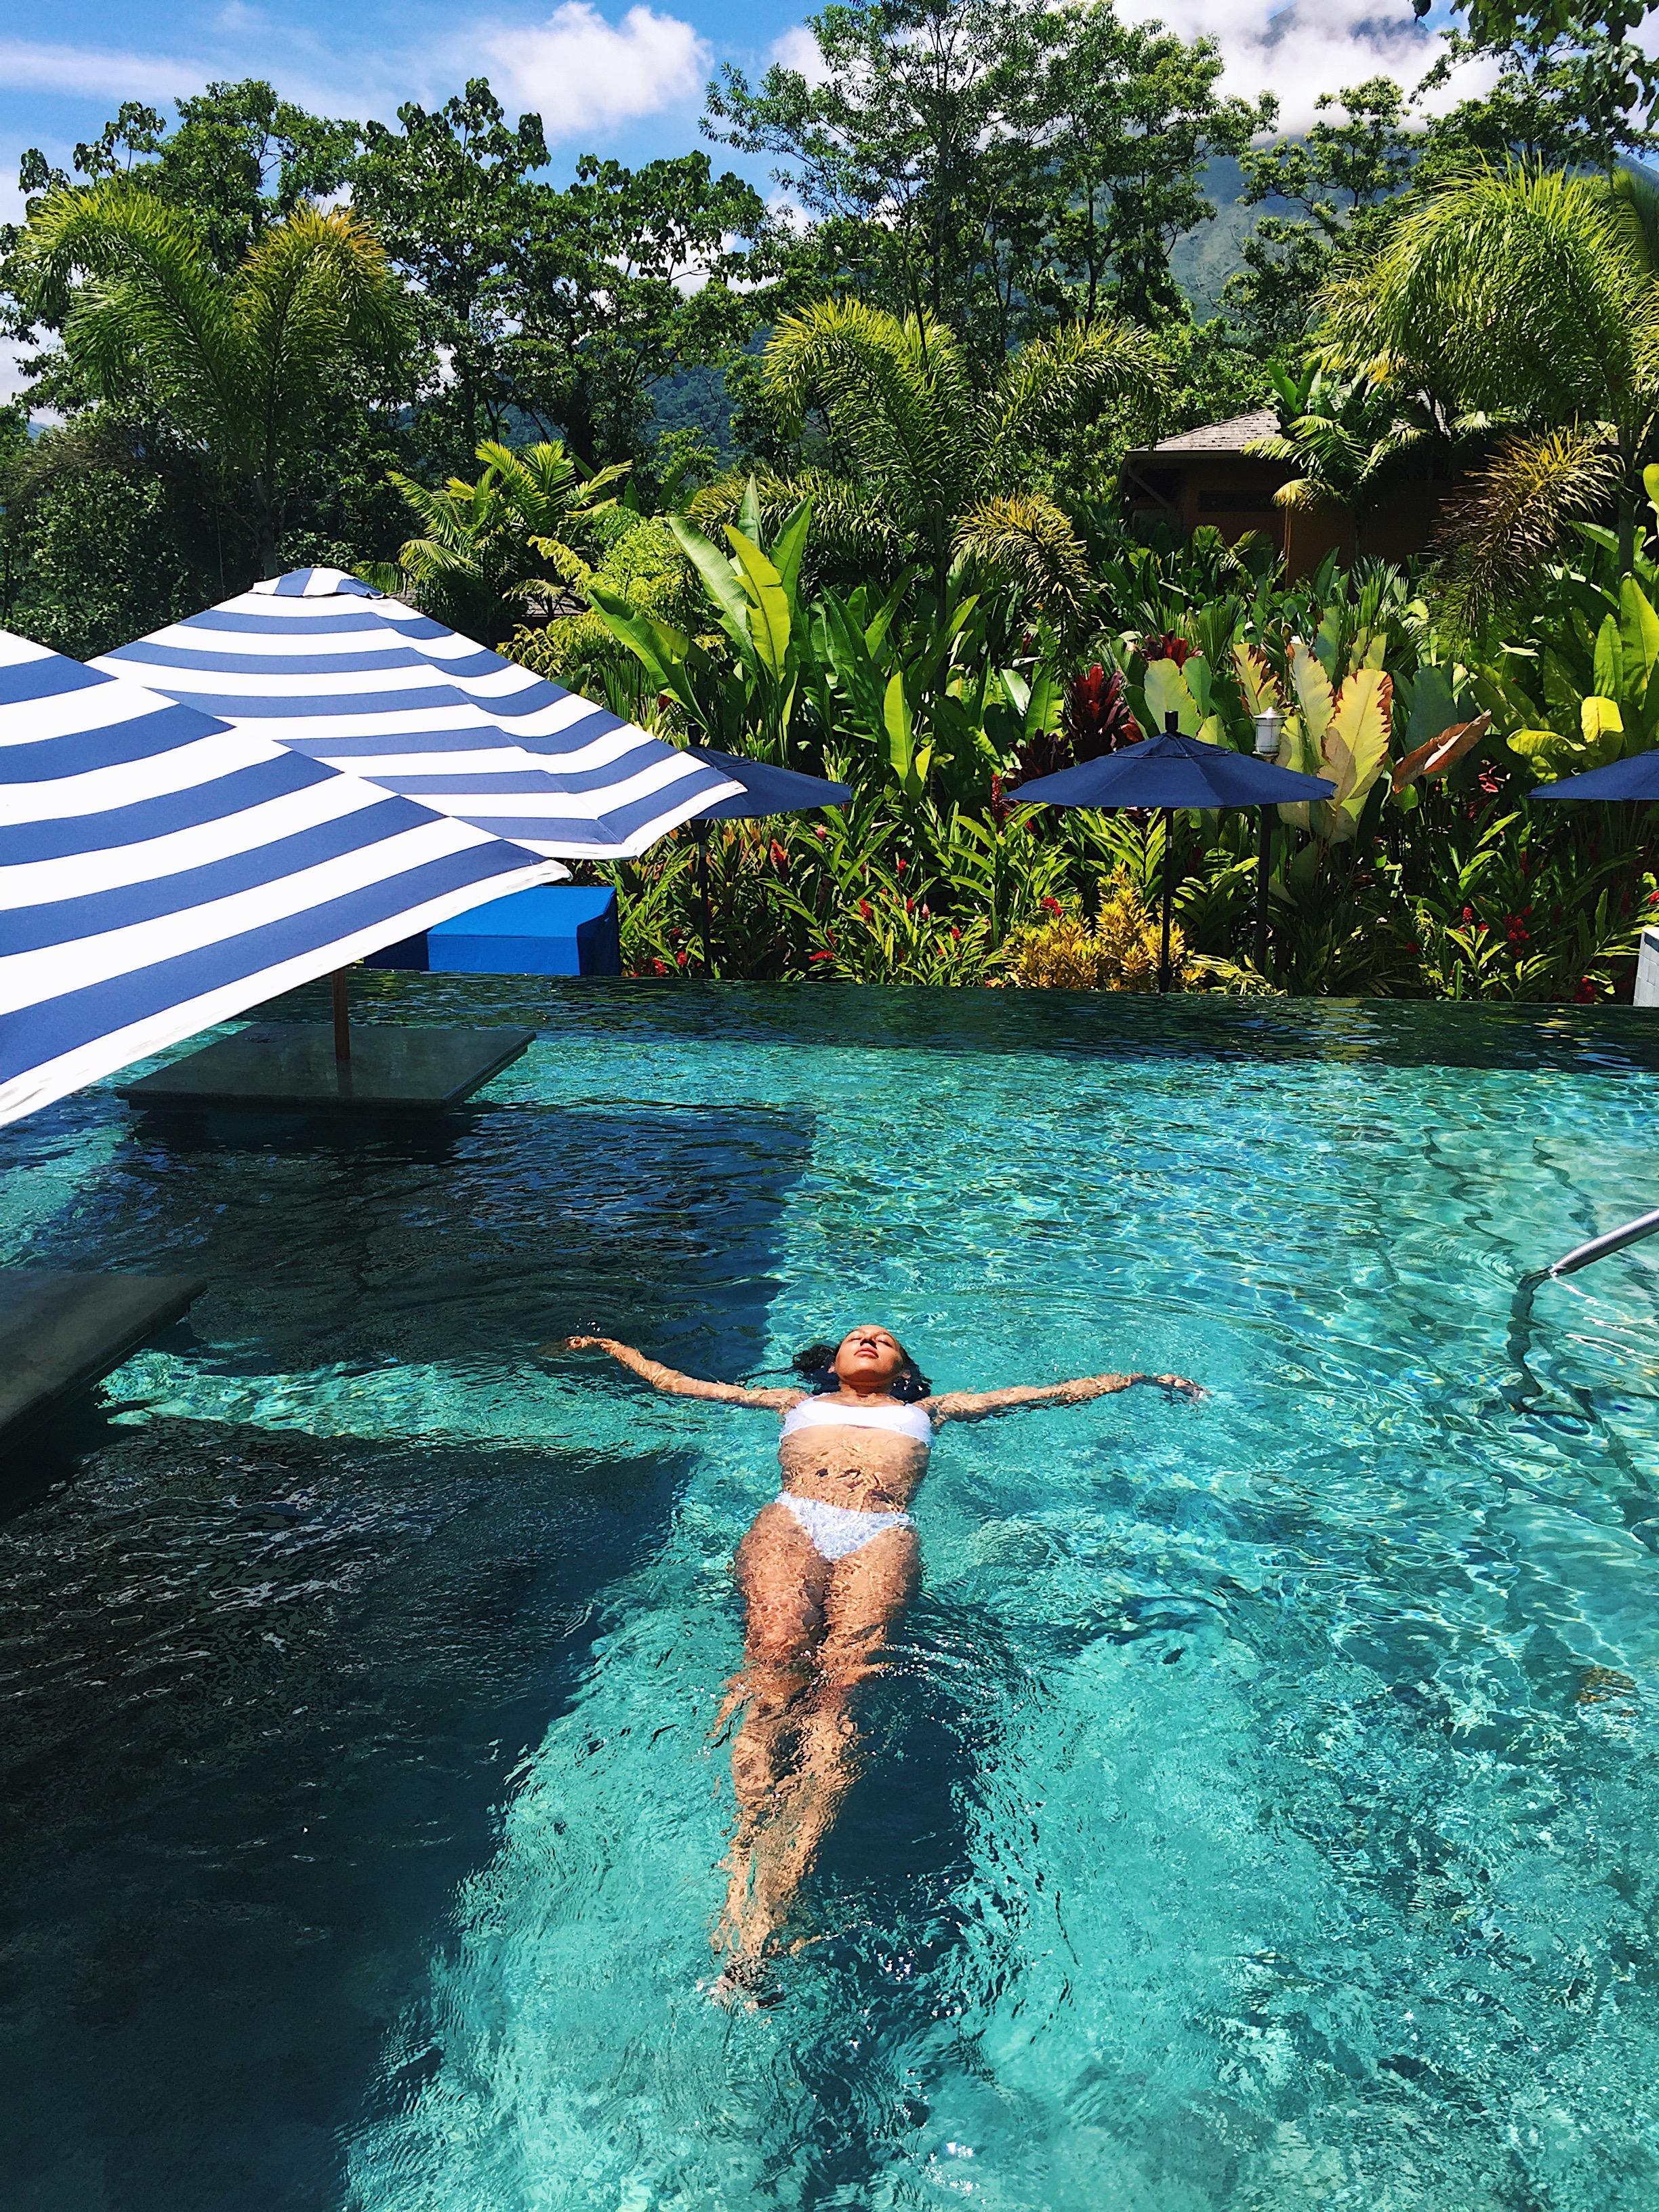 Nayara Hotel swimming pool, Costa Rica   Helena Alyssa